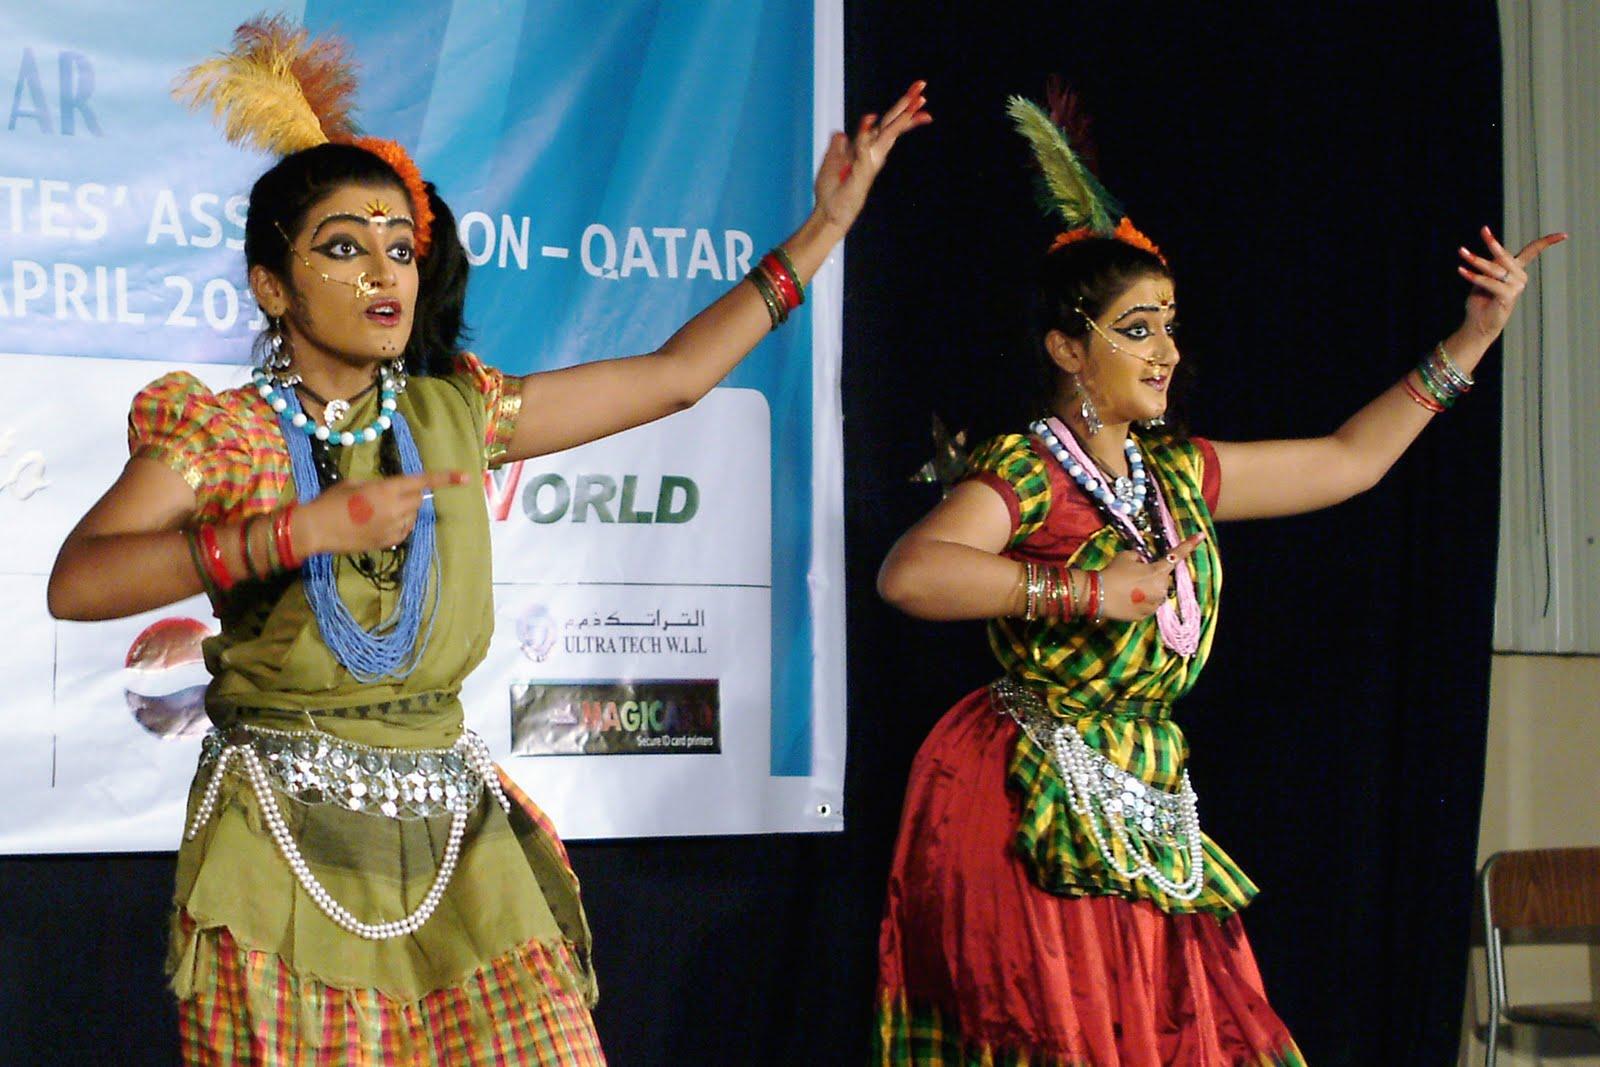 fd8174f612c8 www.varnadancecollections.com, bharatanatyam dance costumes in Usa,  bharatanatyam dance costumes in Uk, bharatanatyam dance costumes in  Australia, ...